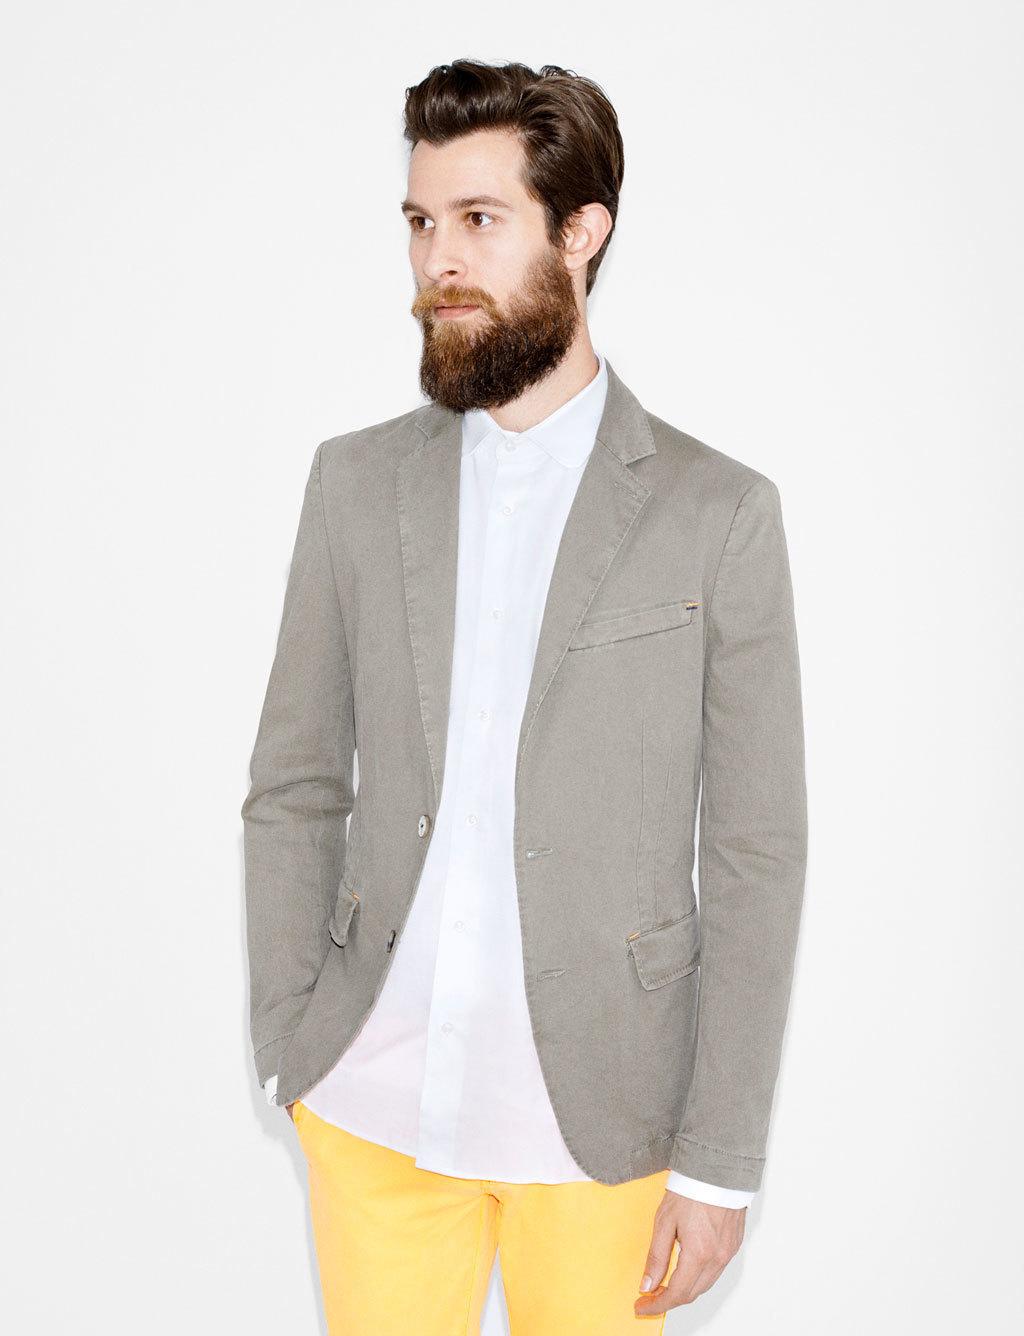 Mens Grey Cotton Blazer White Dress Shirt Yellow Chinos Mens